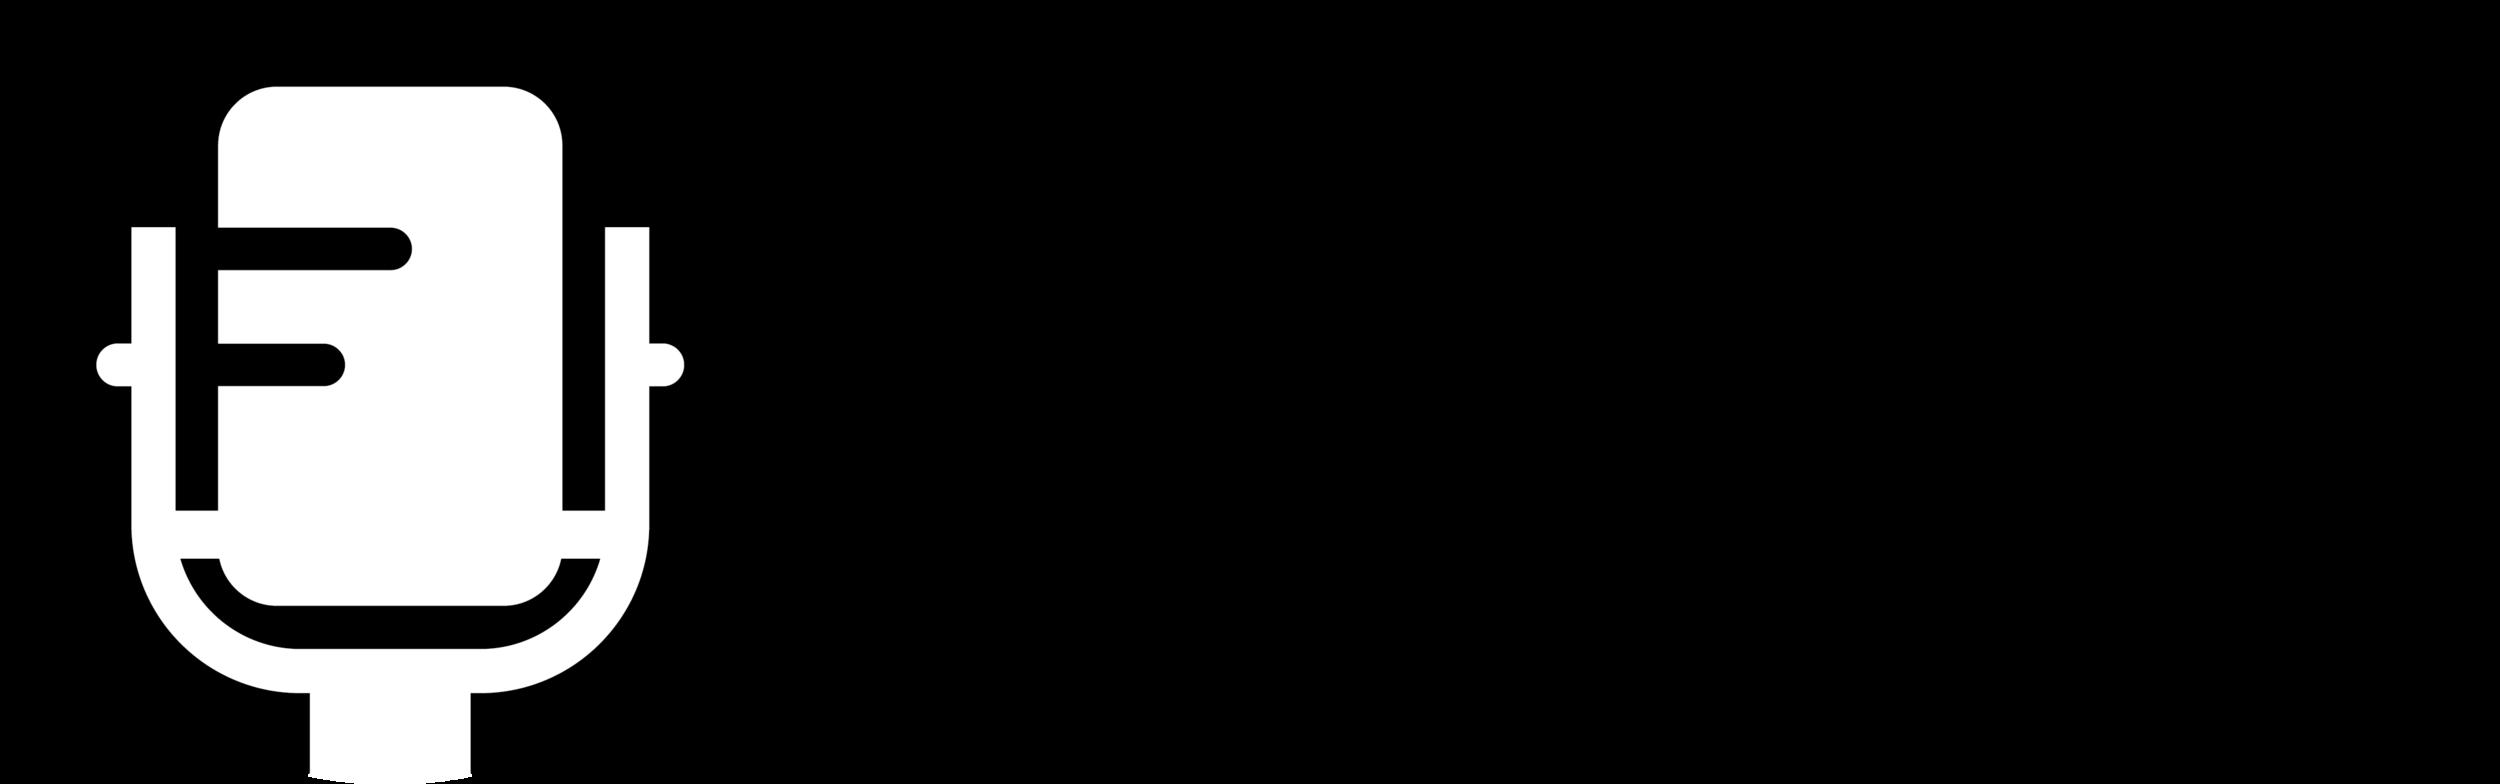 Fetch Full Logo Black.png